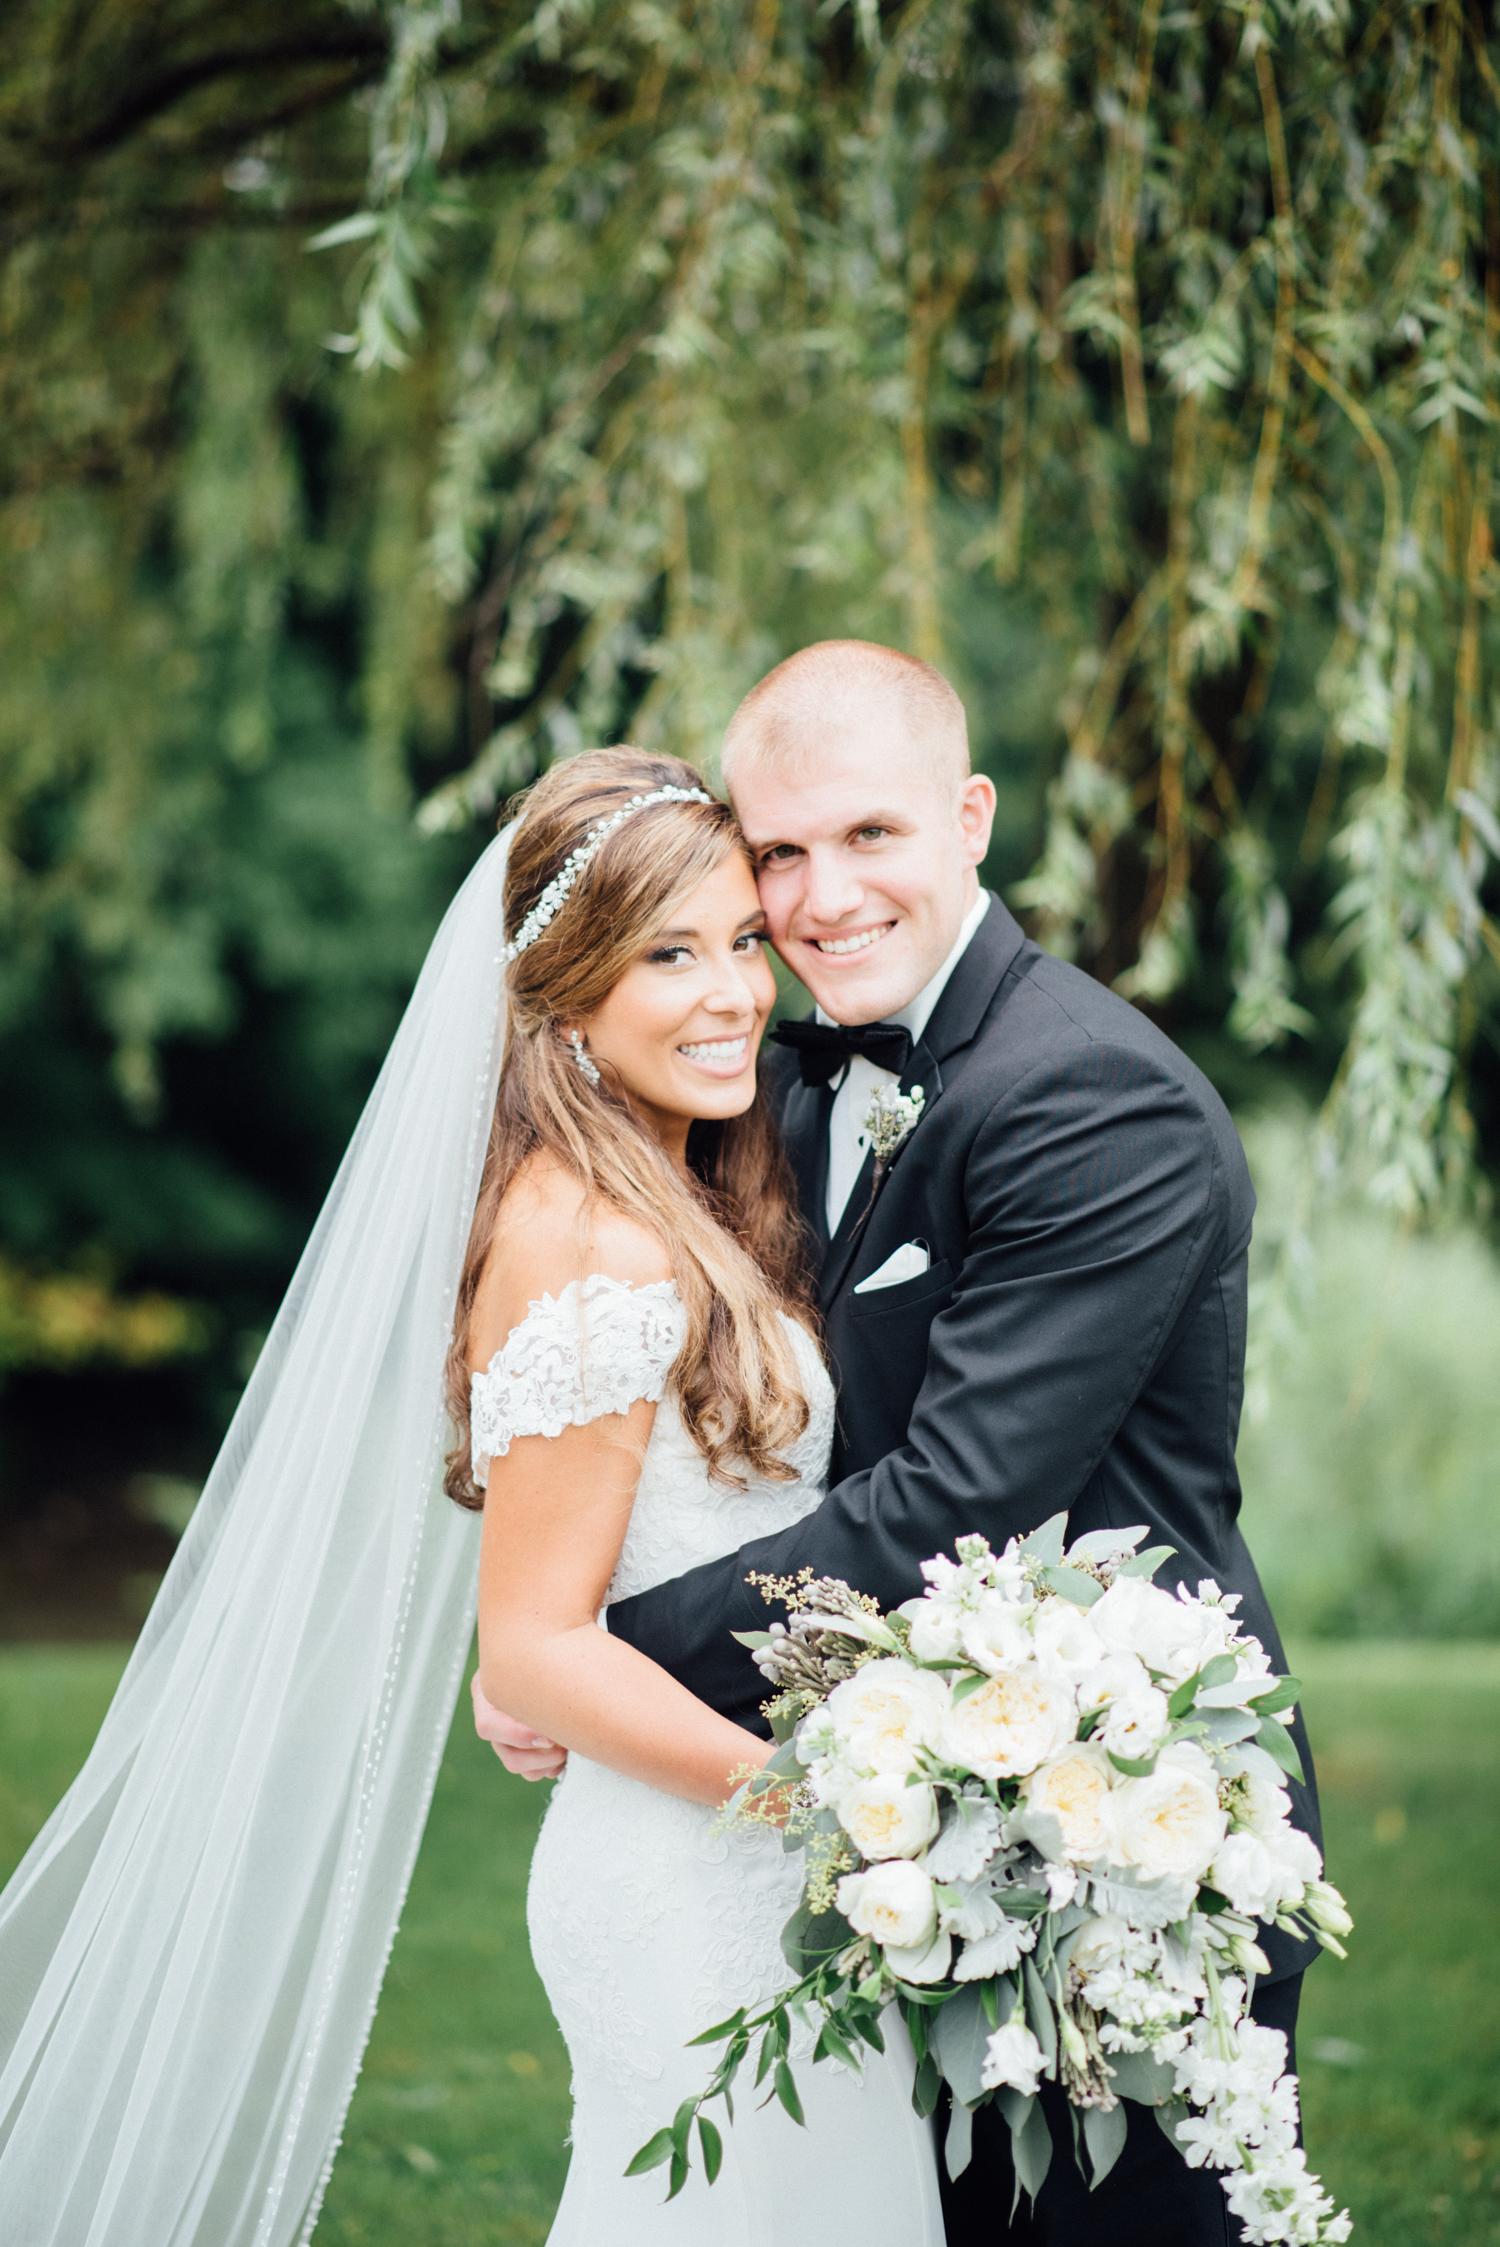 Bri & Spencer Wedding -39.jpg